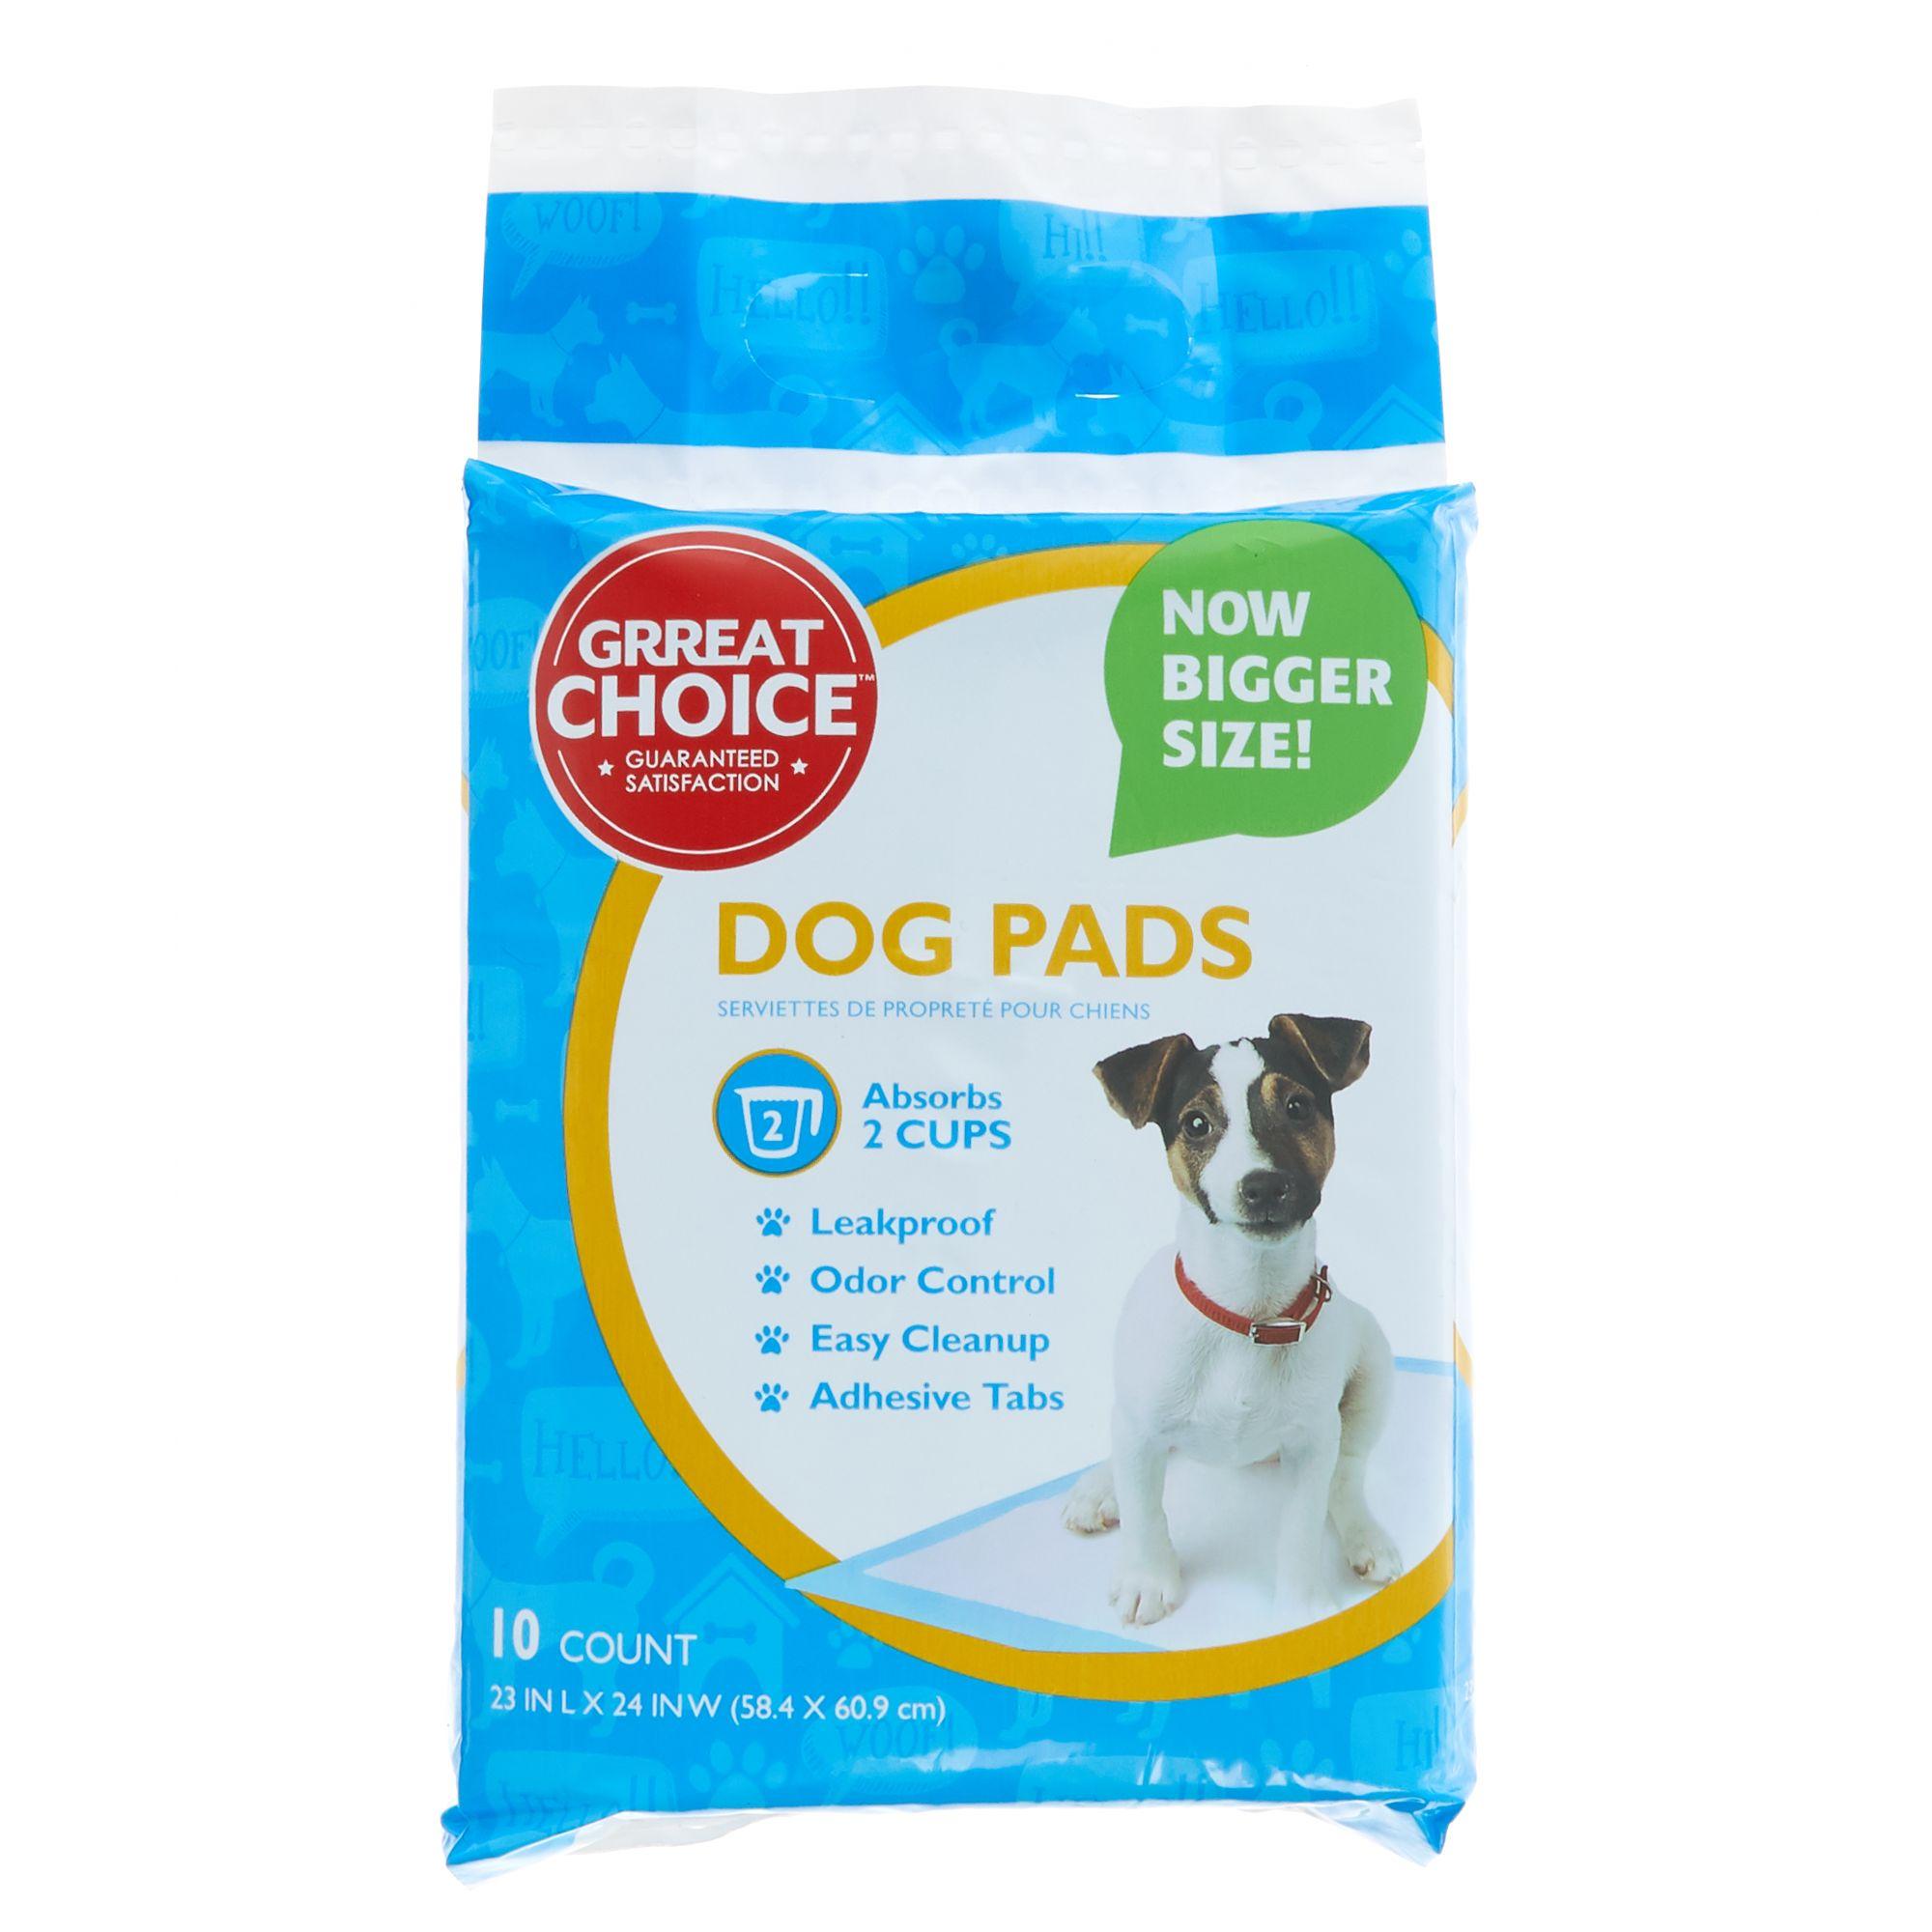 Groovy Grreat Choice Dog Pads Short Links Chair Design For Home Short Linksinfo